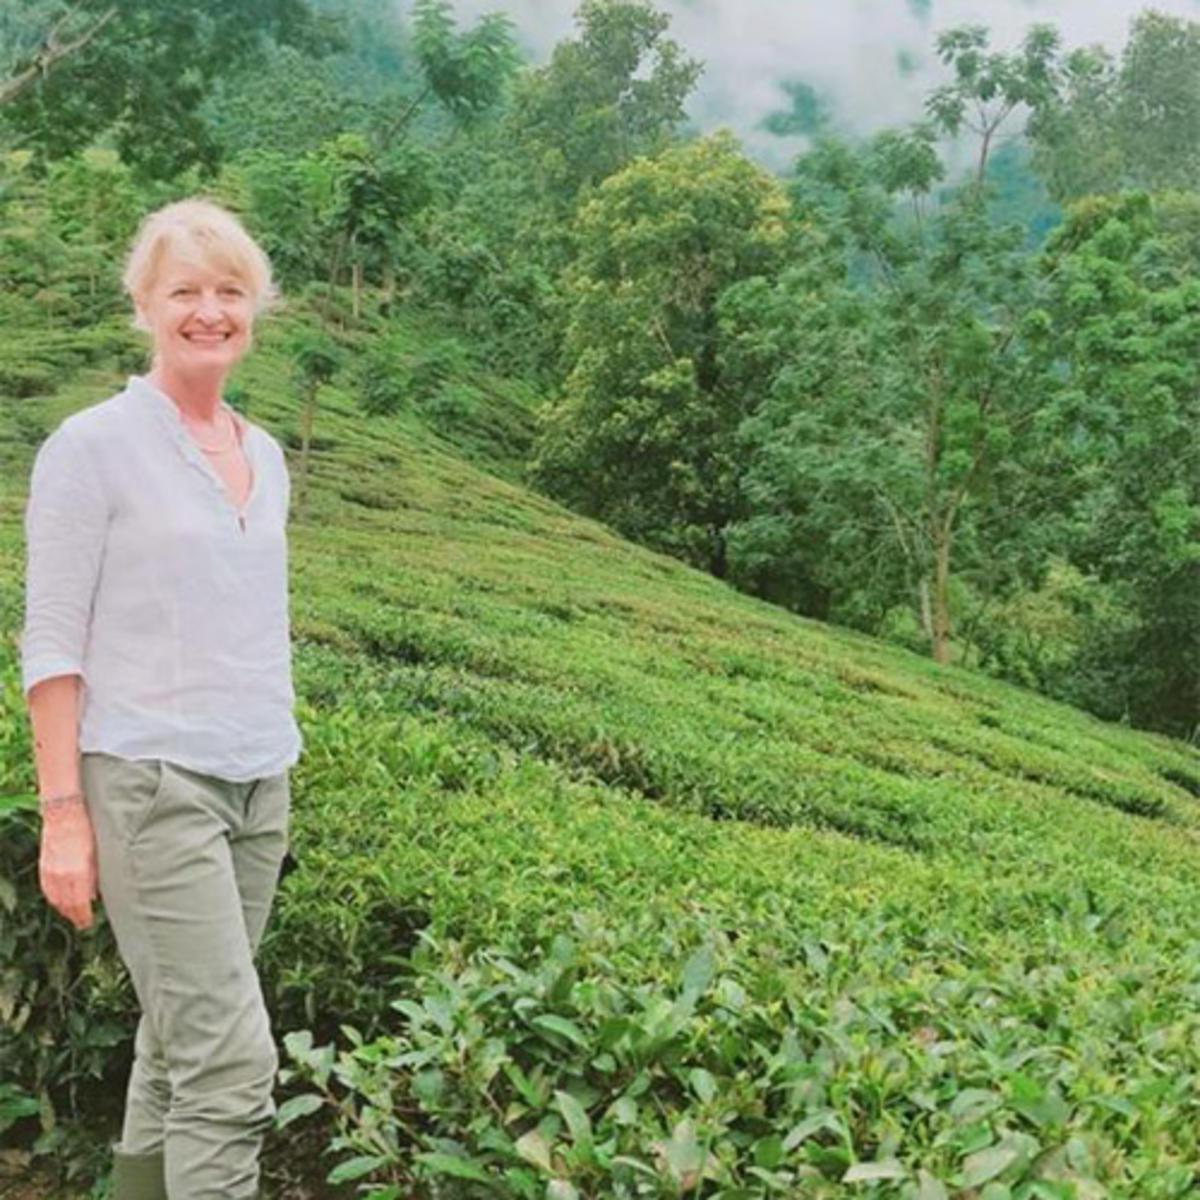 Il mio viaggio in Darjeeling